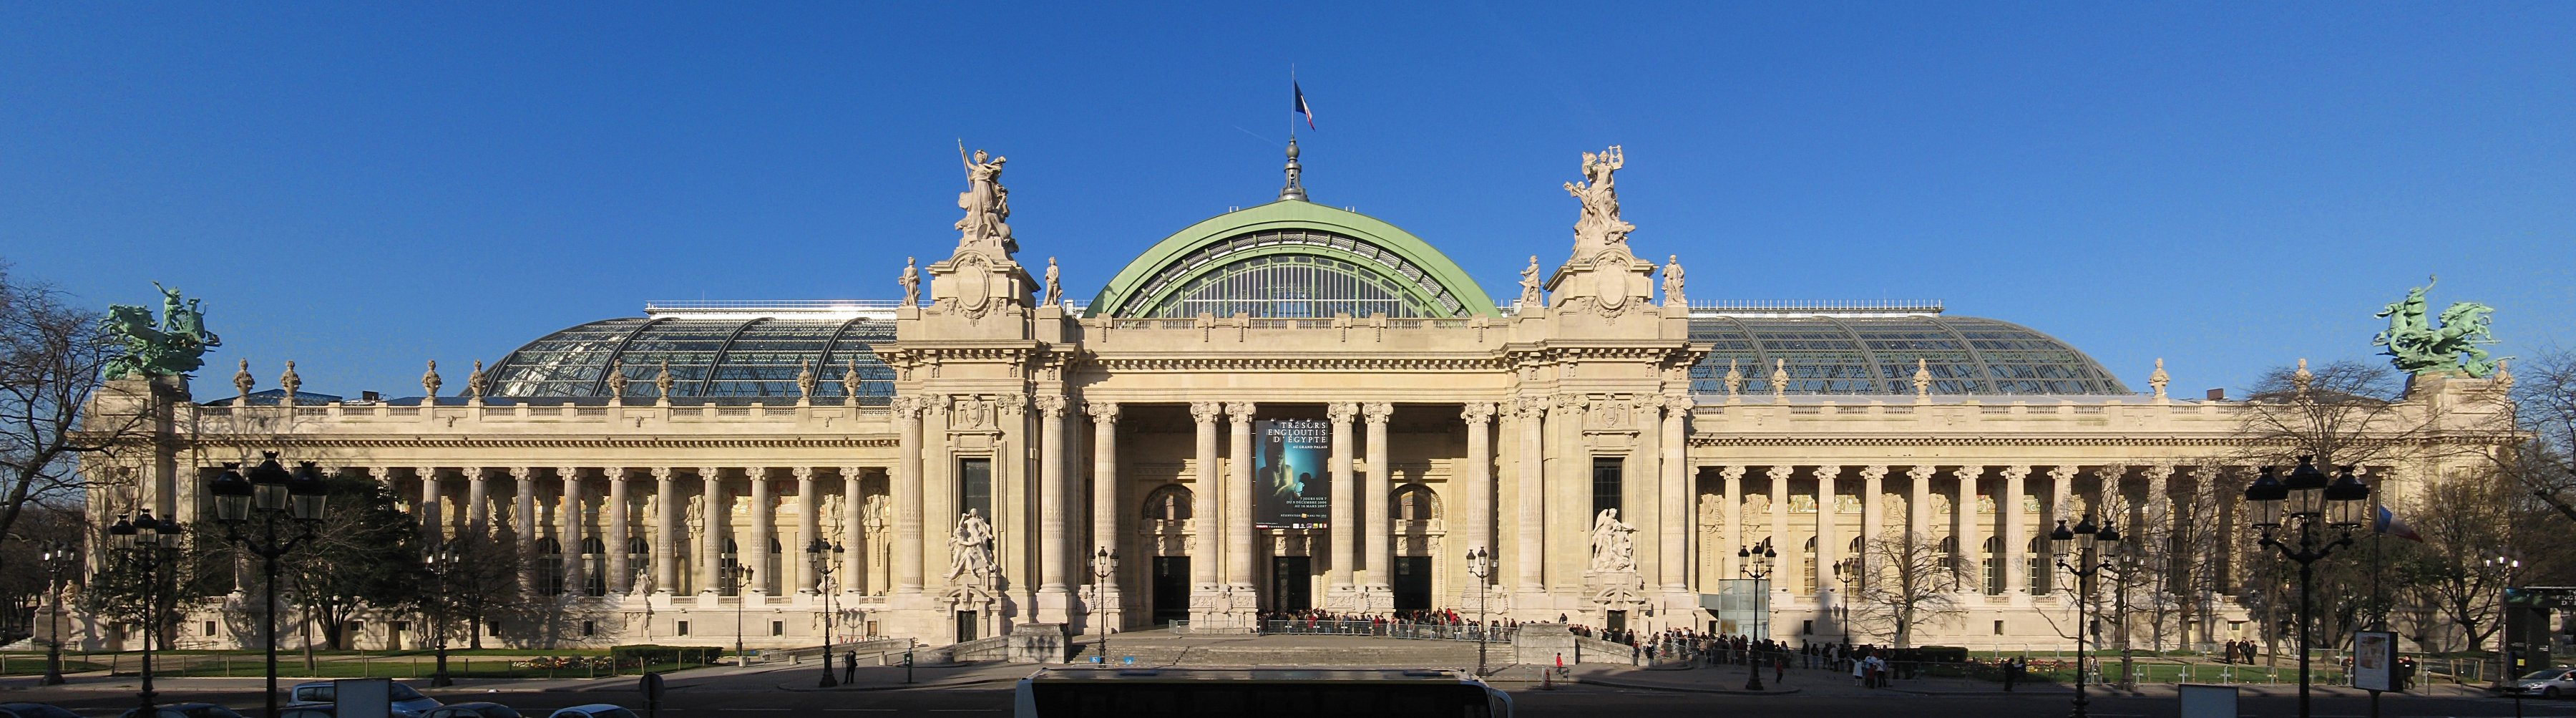 Le grand palais events in the nave 2012 denisetinparis - Expo le grand palais ...